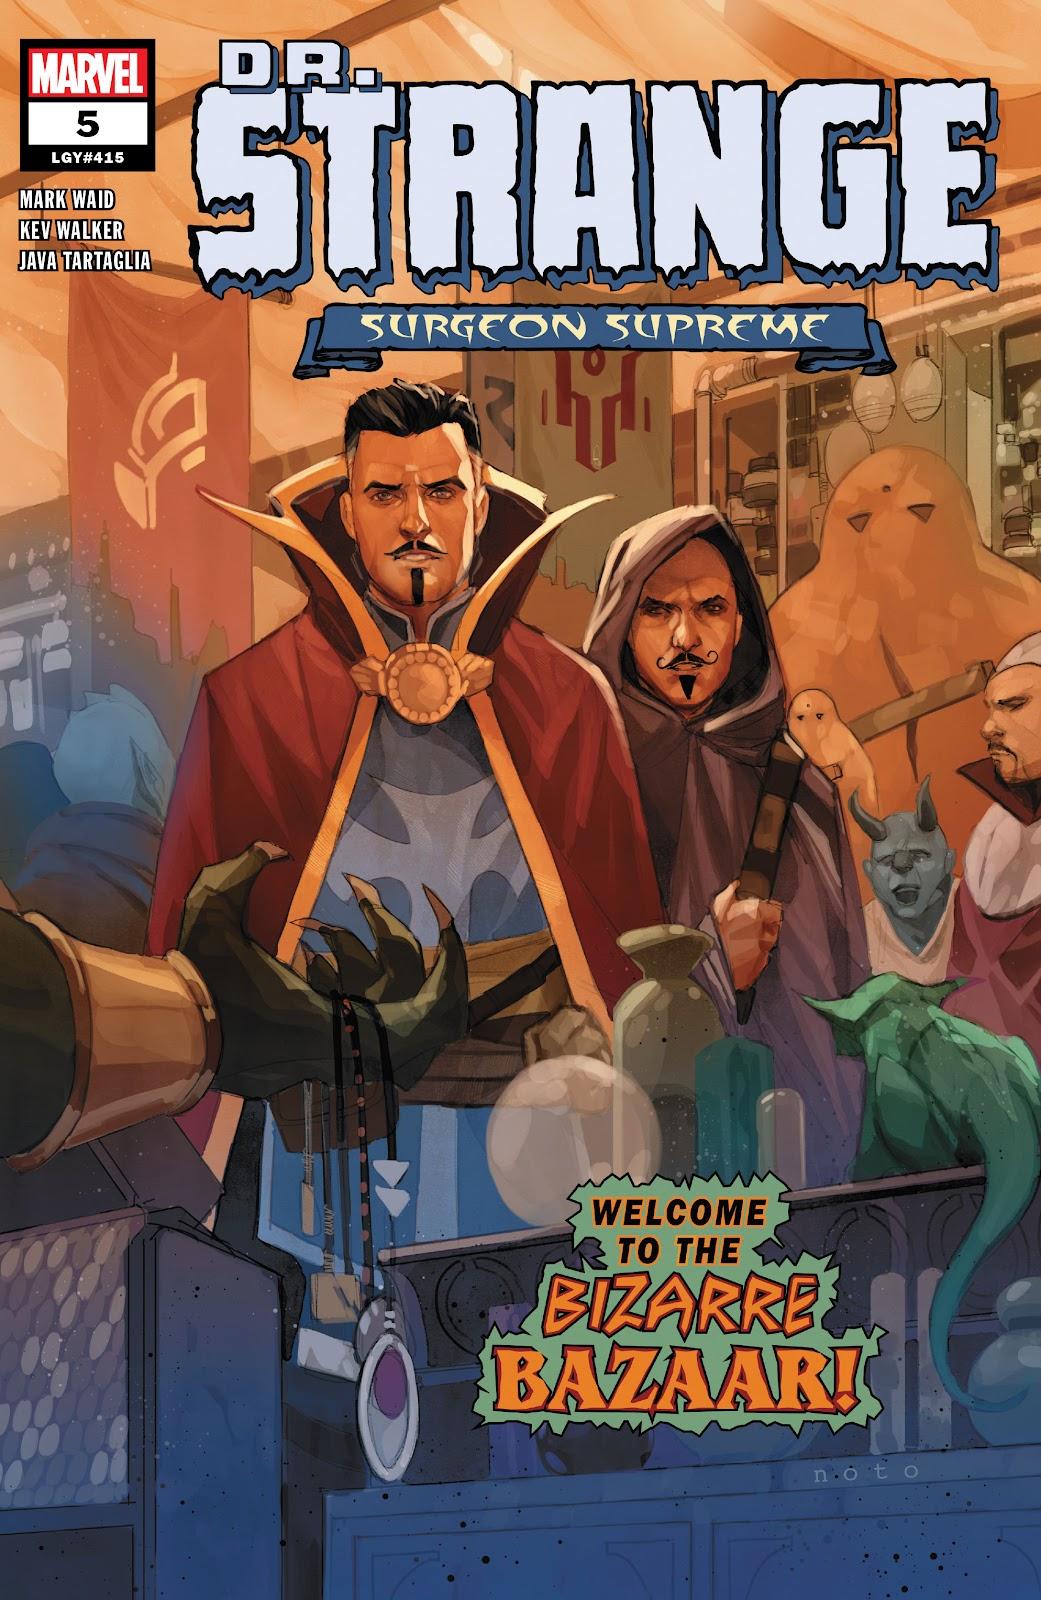 Read online Dr. Strange comic -  Issue #5 - 1